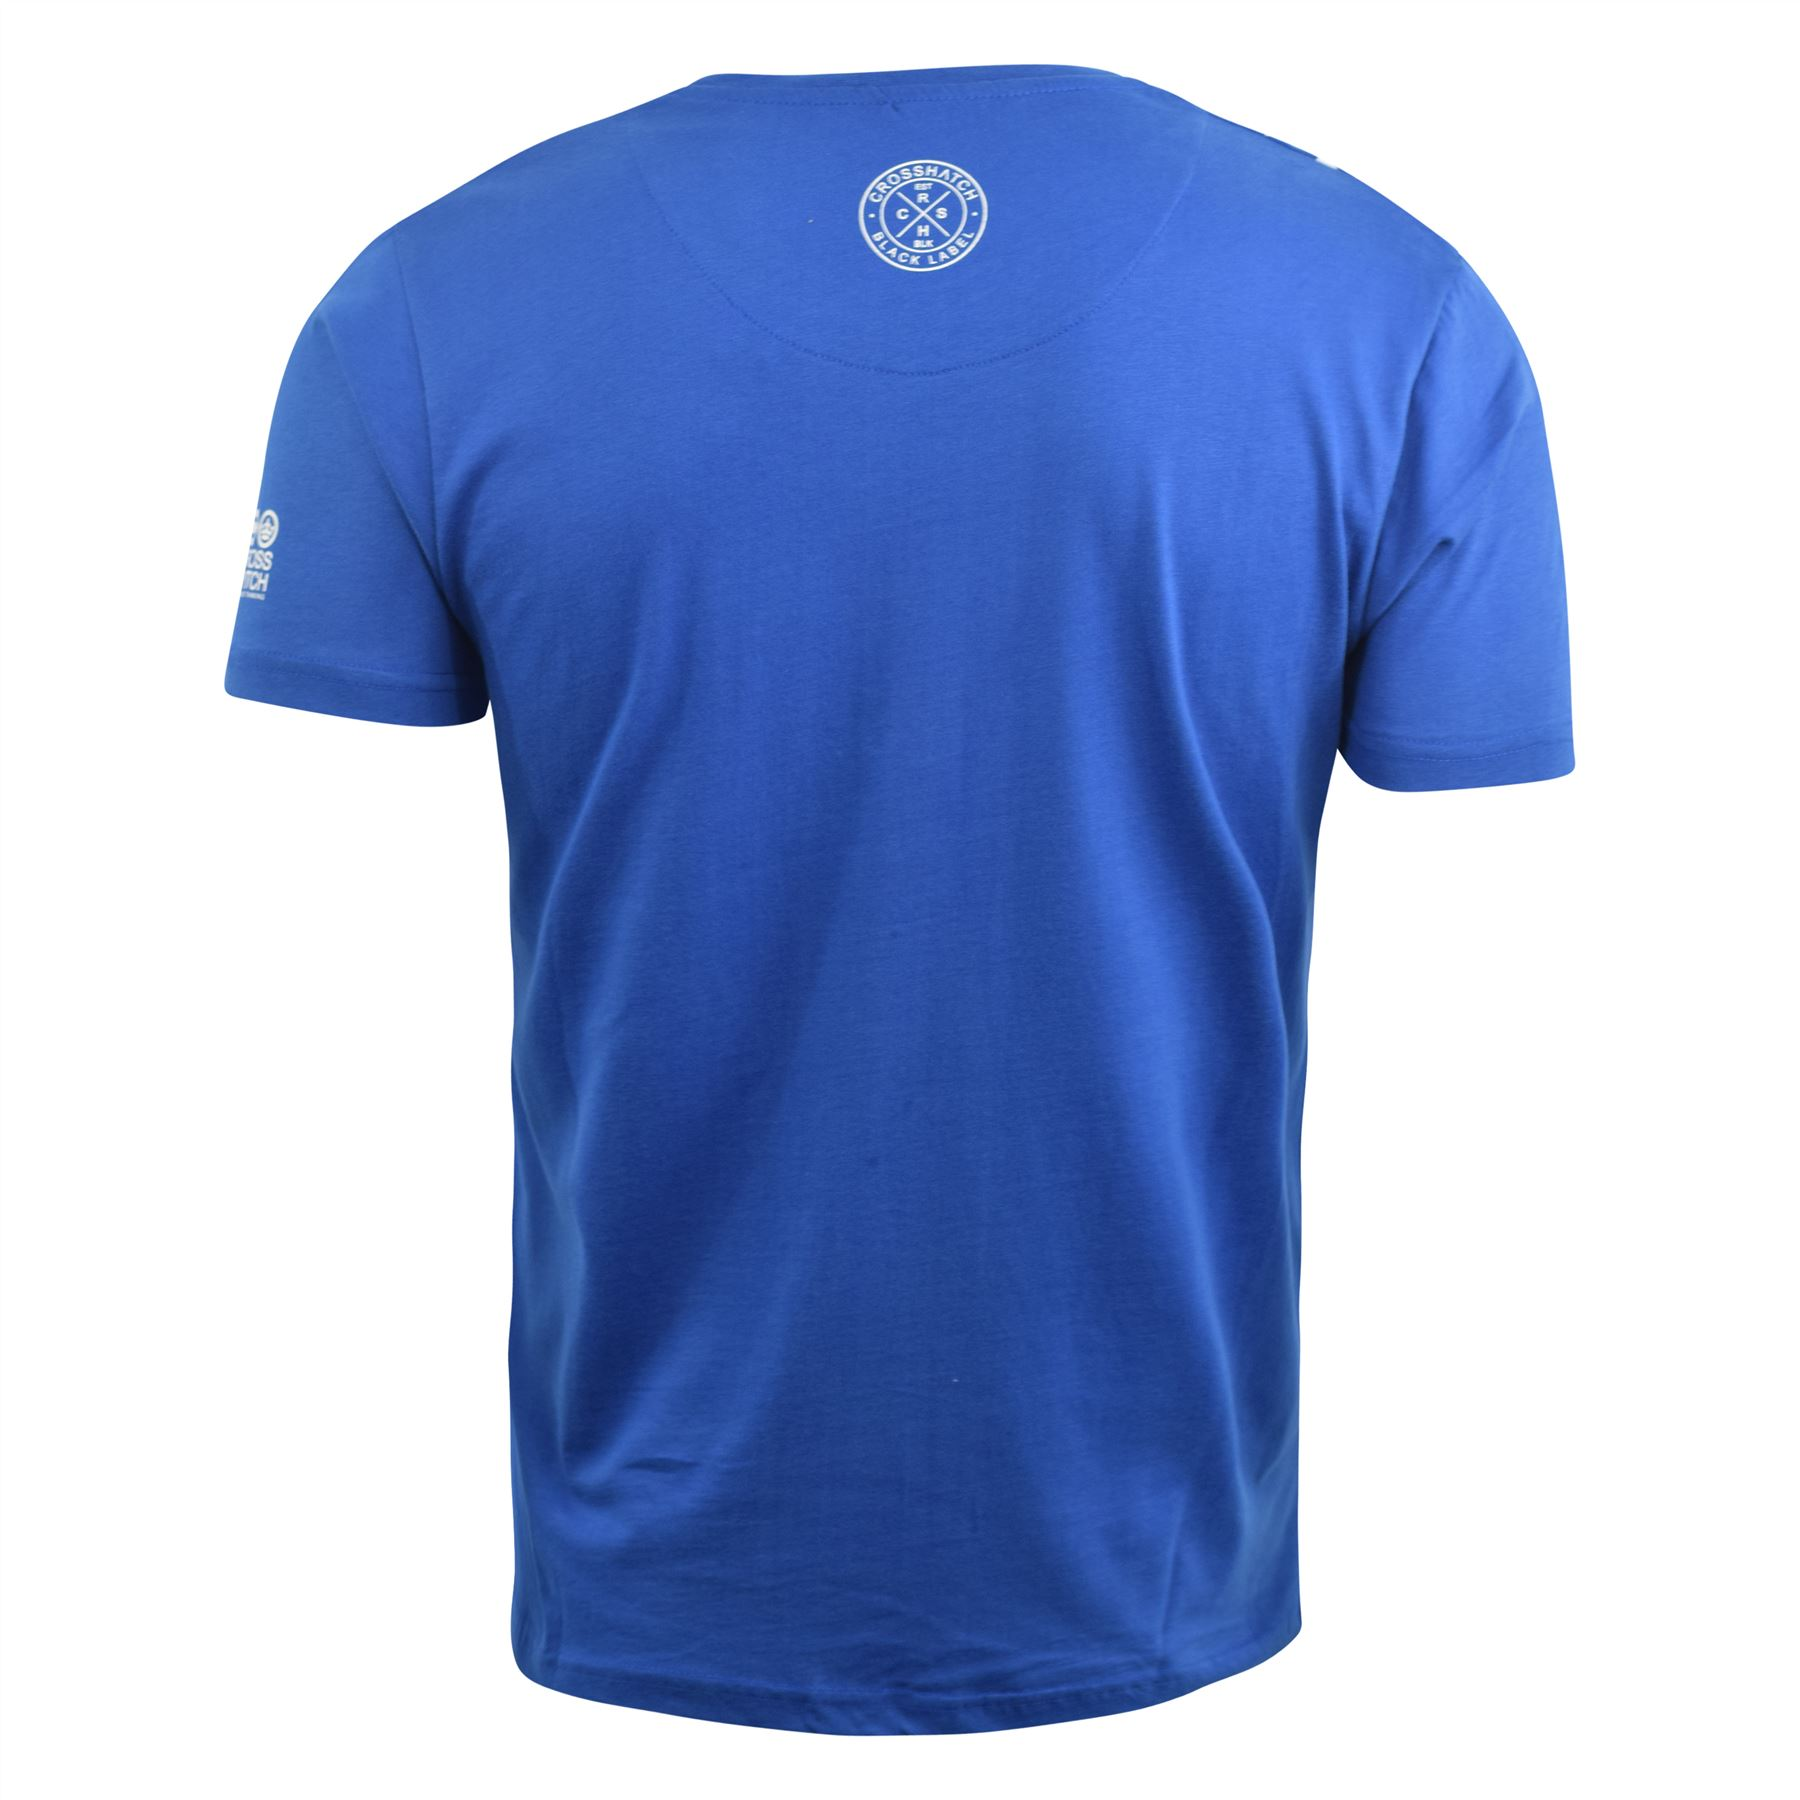 Para-Hombre-Crosshatch-Camiseta-Grafico-Cuello-Redondo-Manga-Corta-Camiseta-Top-wolvey miniatura 5